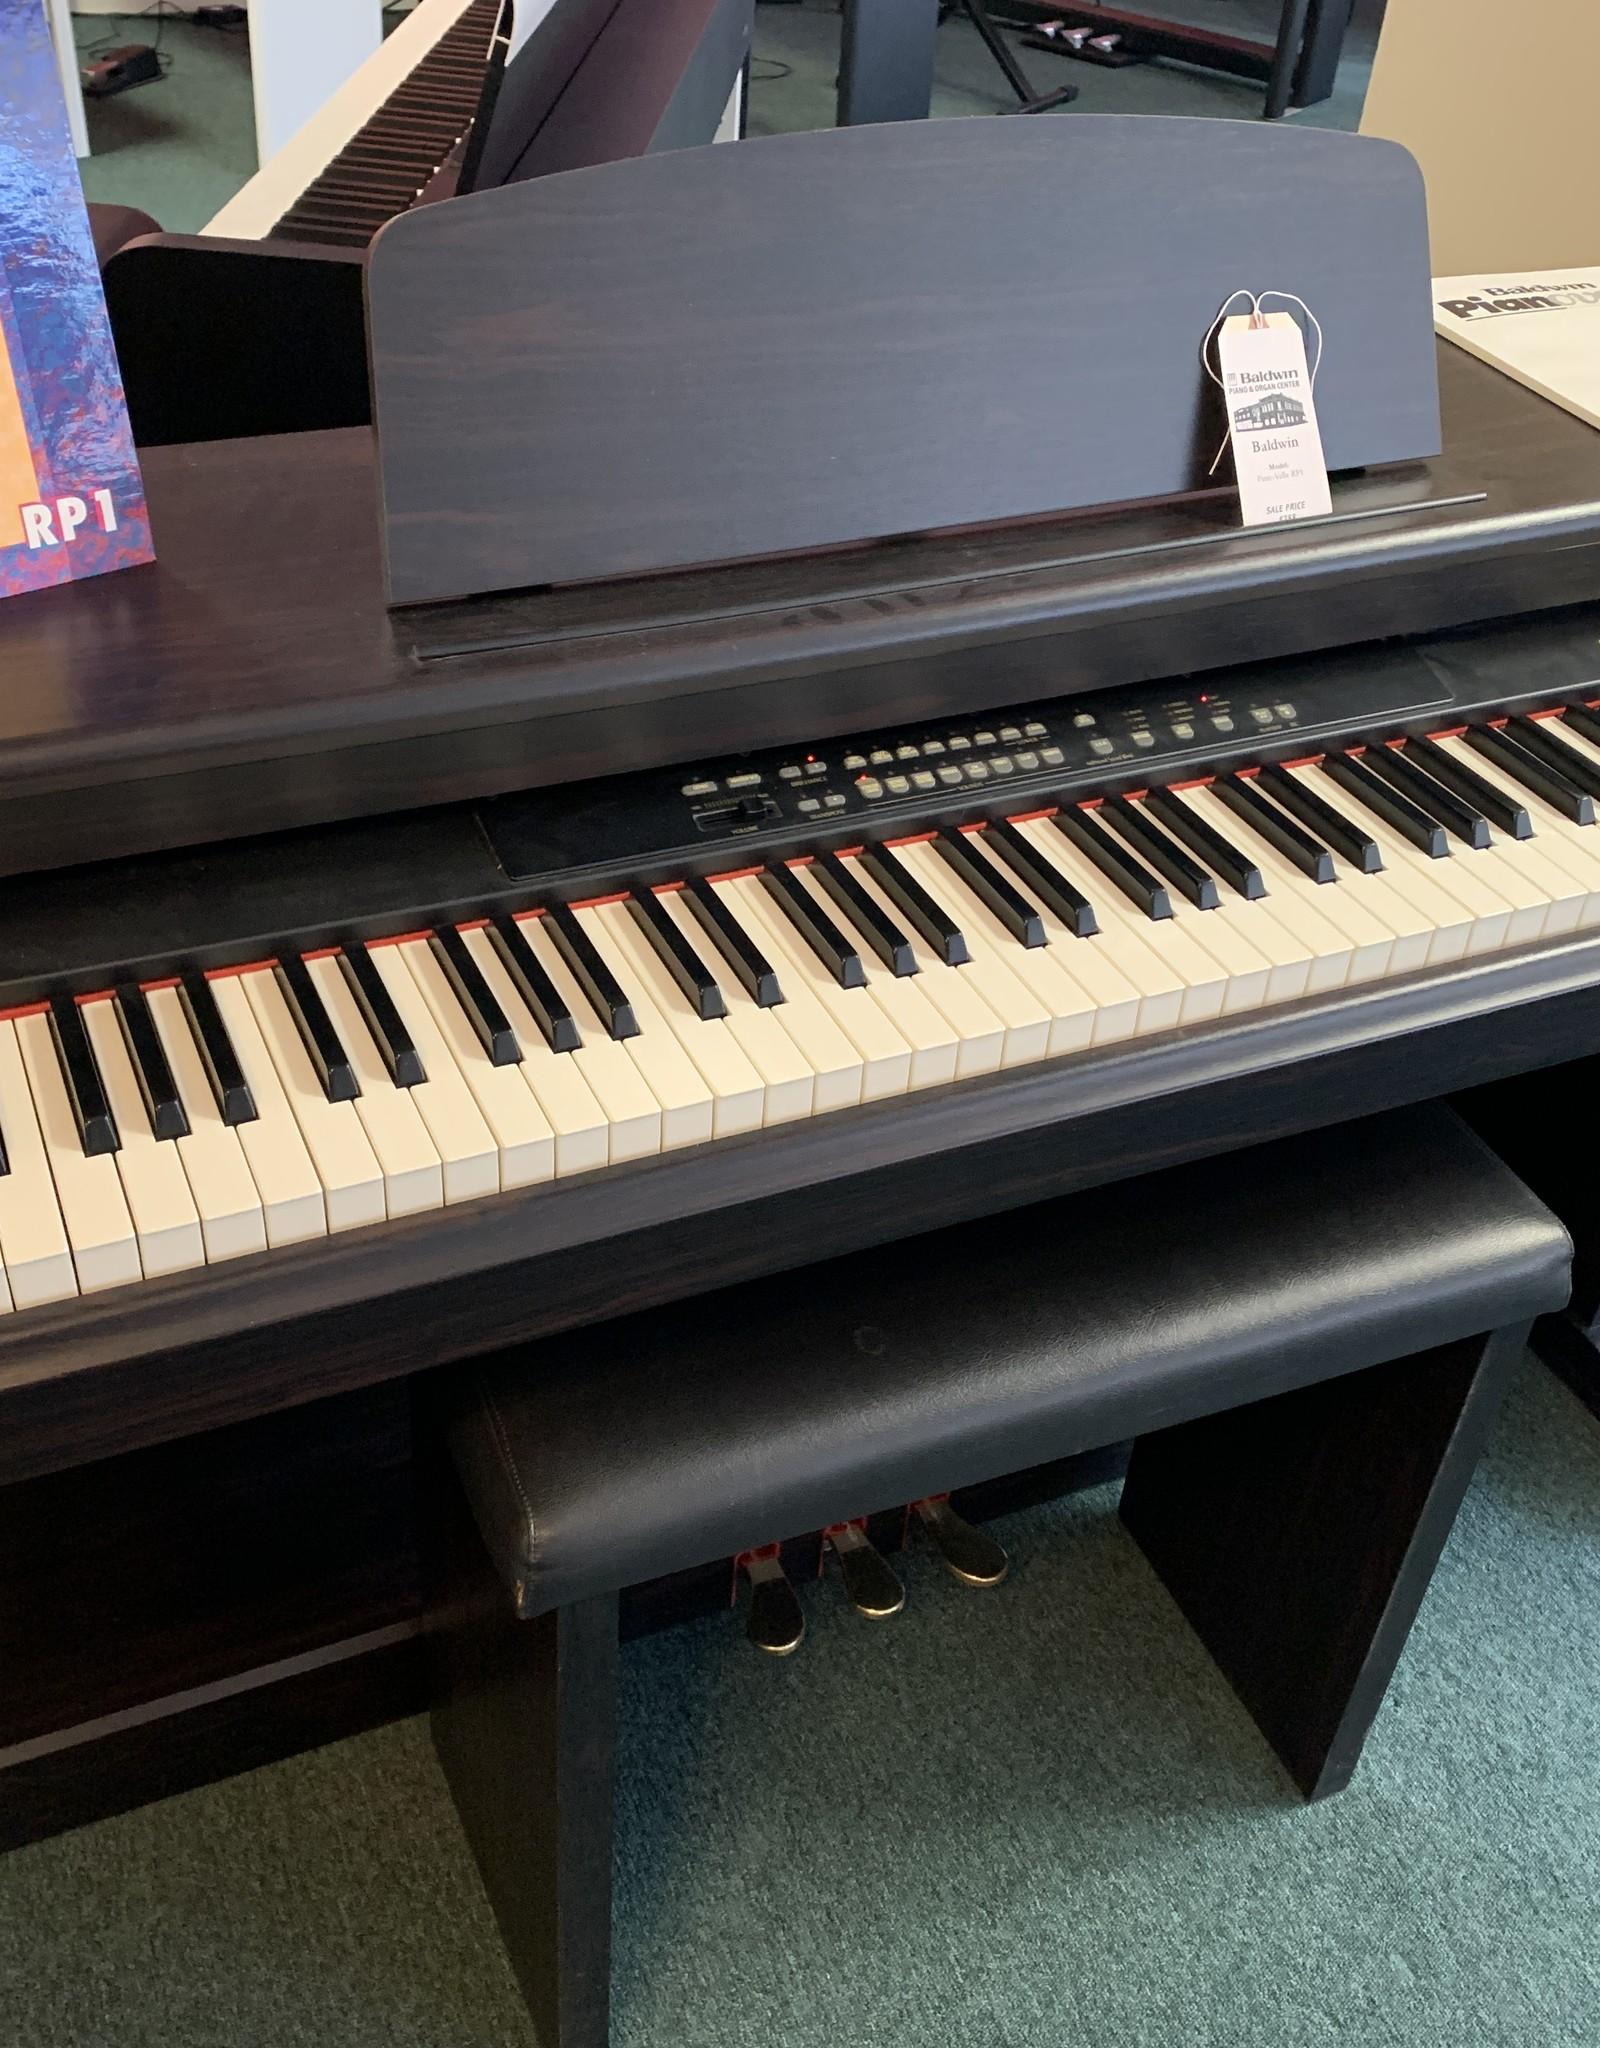 Baldwin Baldwin RP-1 Pianovelle Upright Digital Piano (Pre-owned)